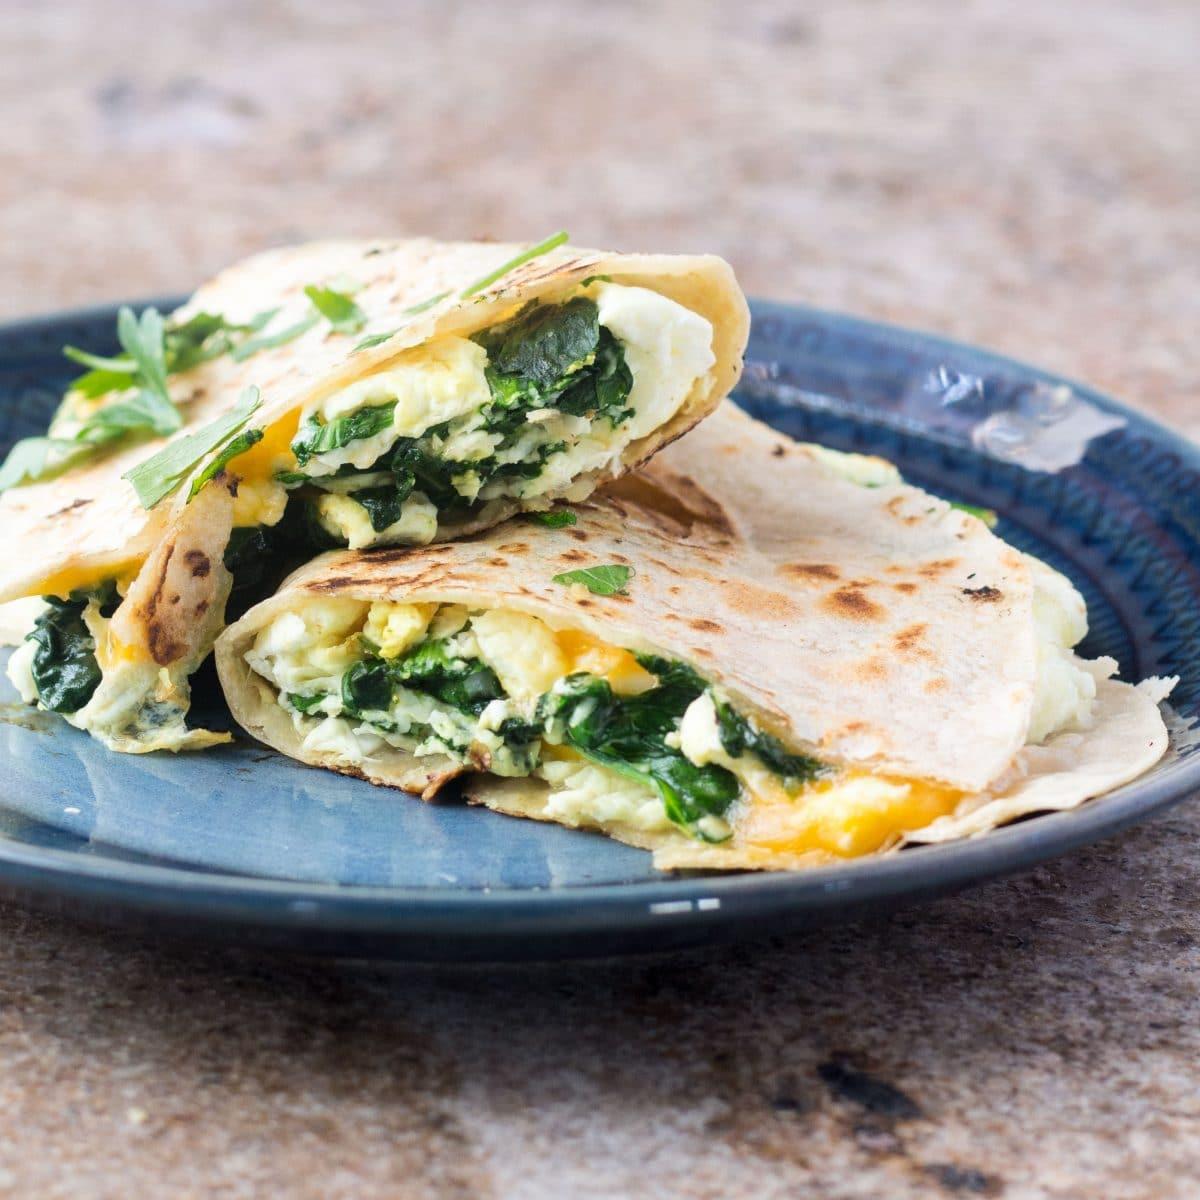 Healthy Breakfast Quesadilla Recipes top 20 Healthy Breakfast Quesadilla Gluten Free Ve Arian